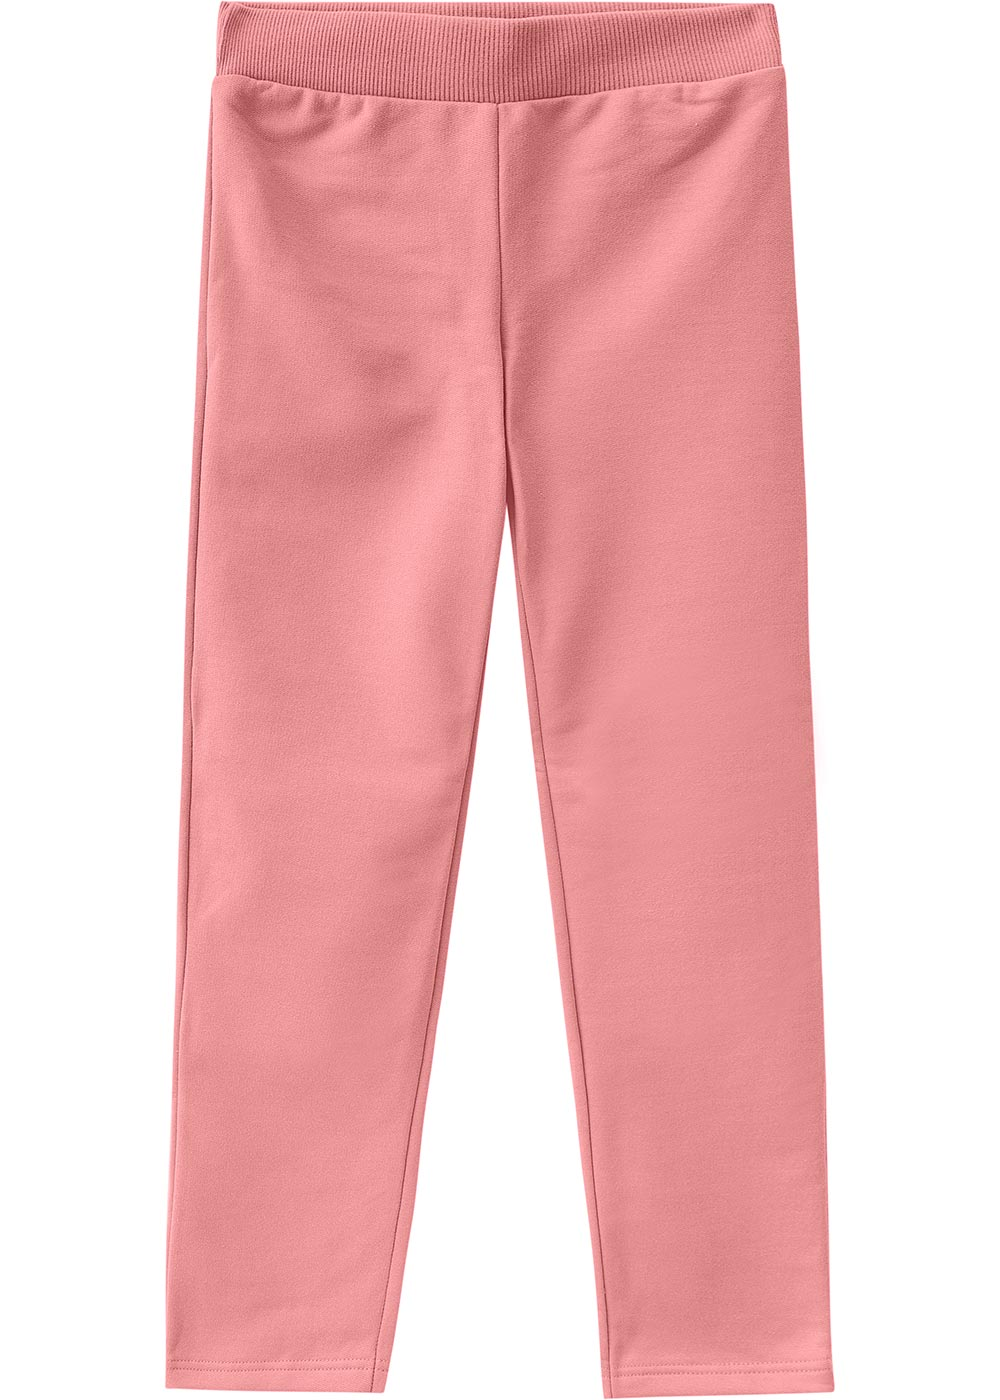 Calça Infantil Feminina Rosa Básica - Malwee